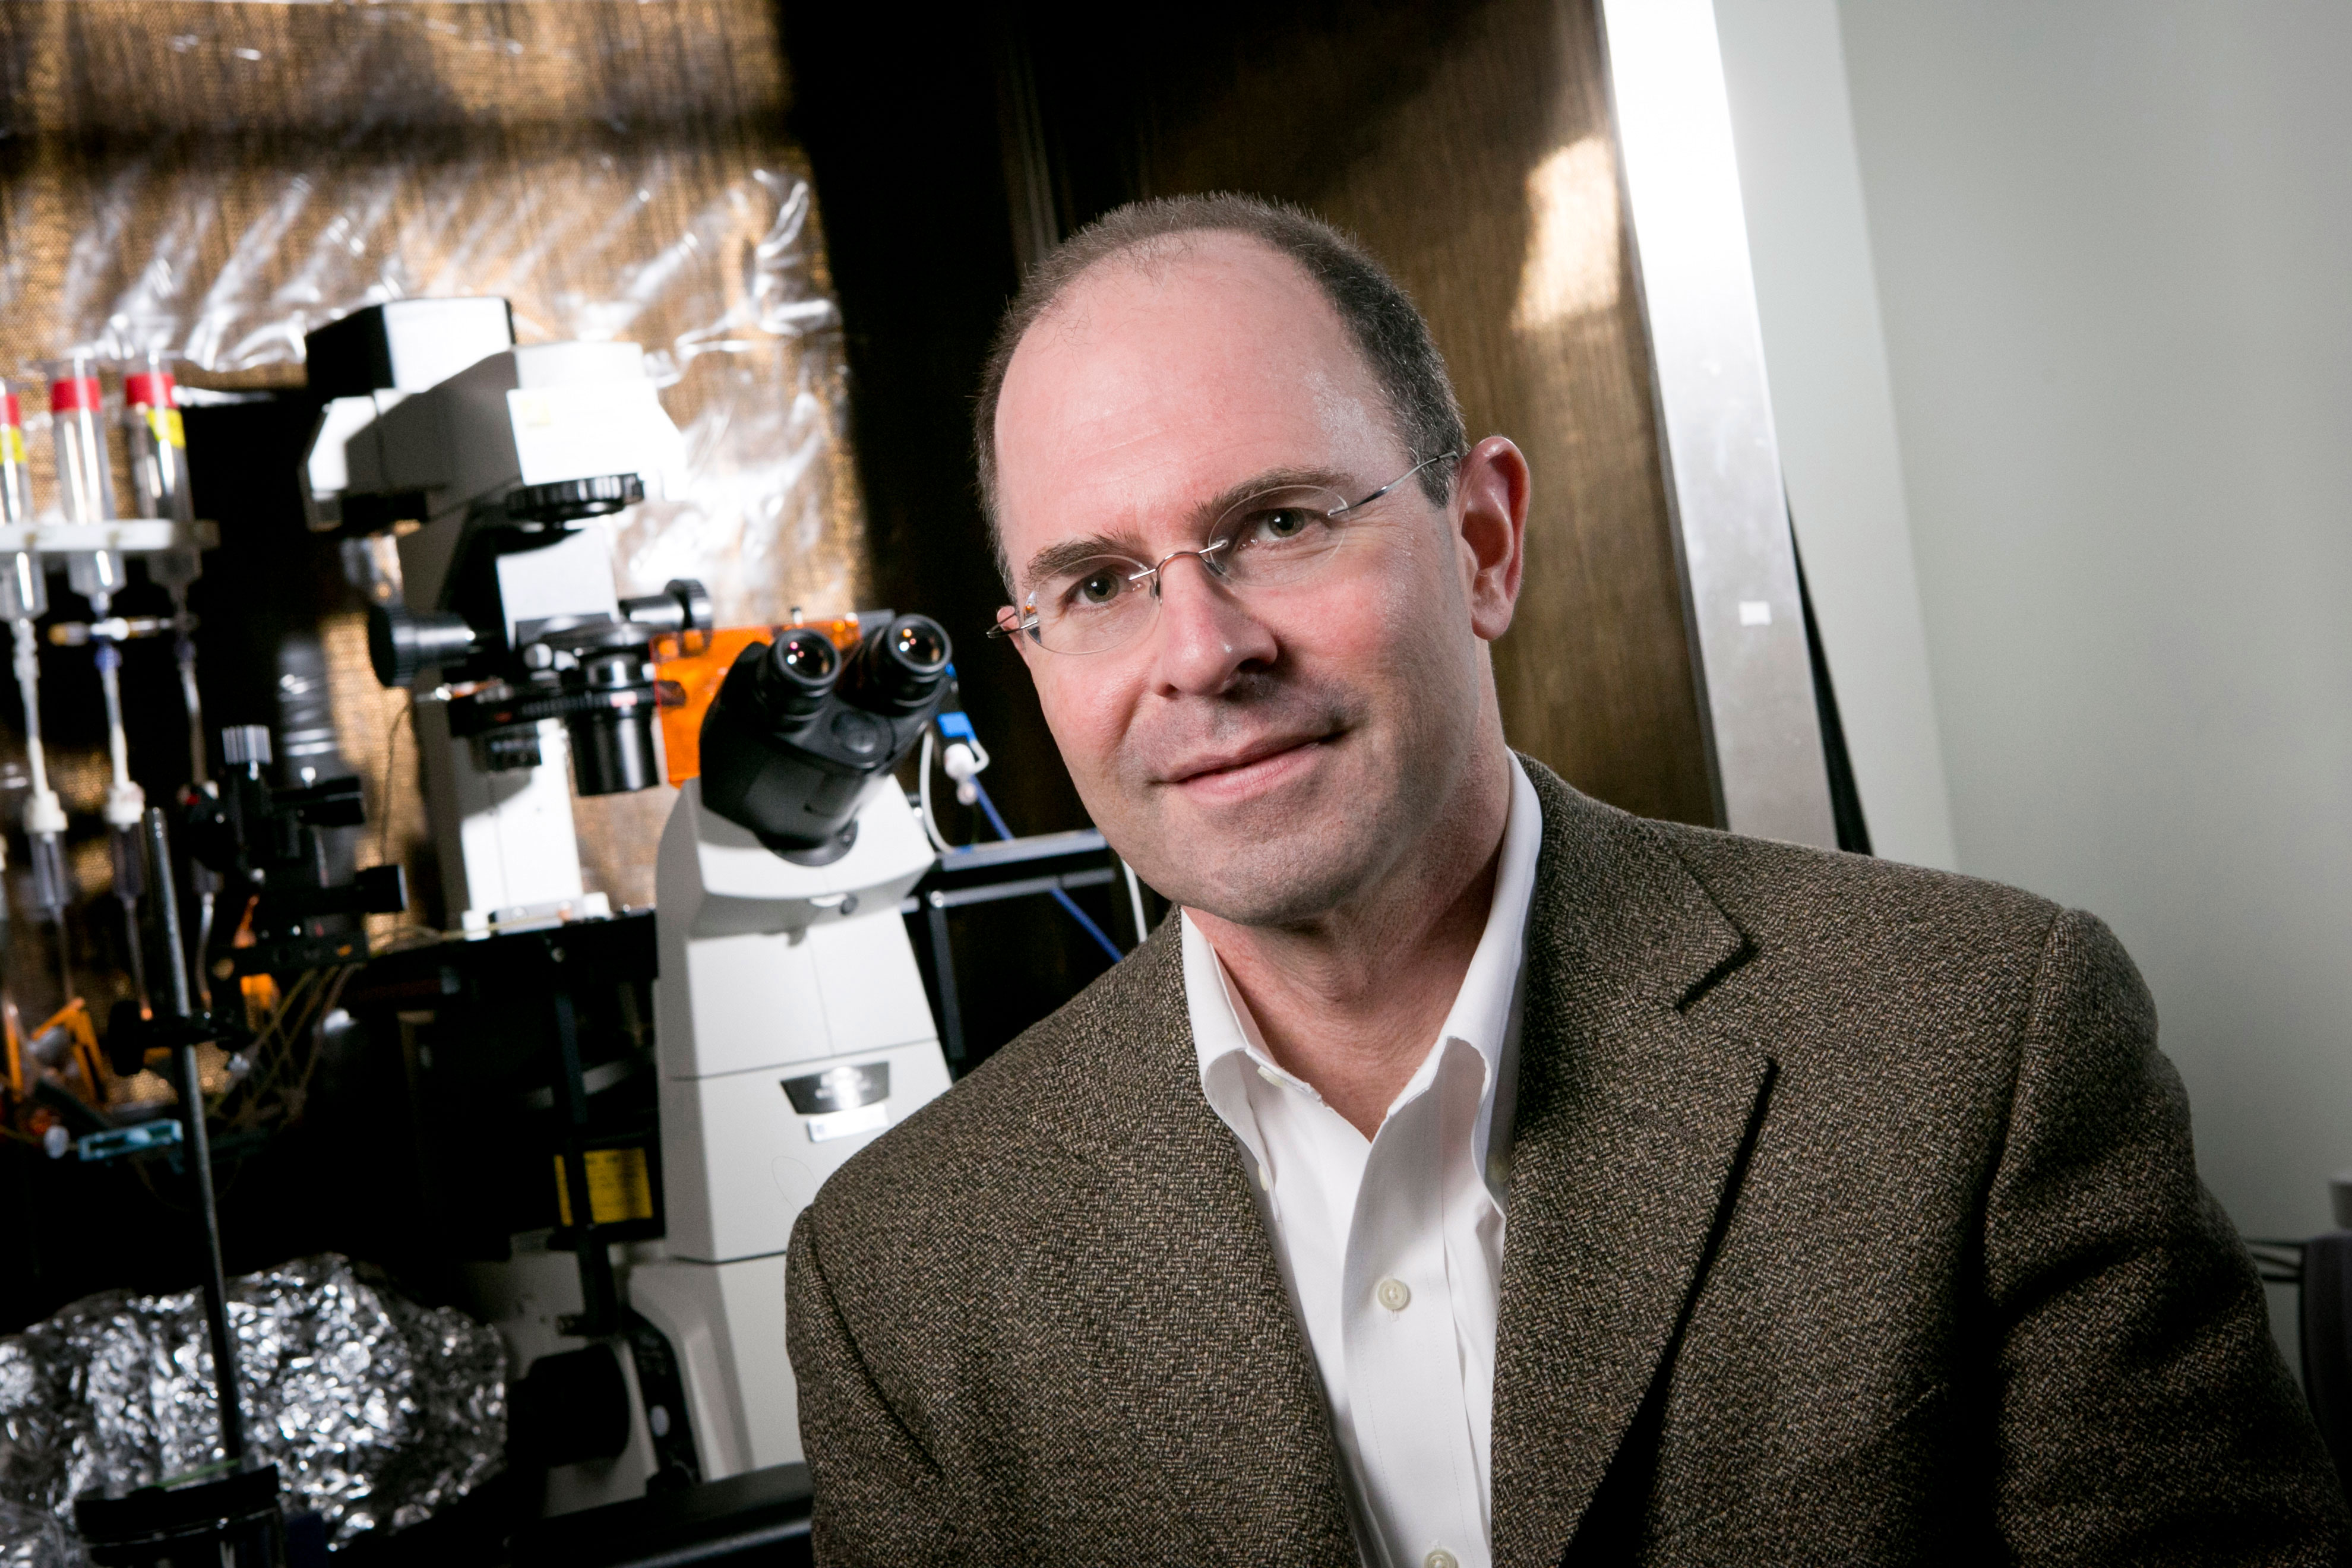 Dr. Geoffrey Pitt